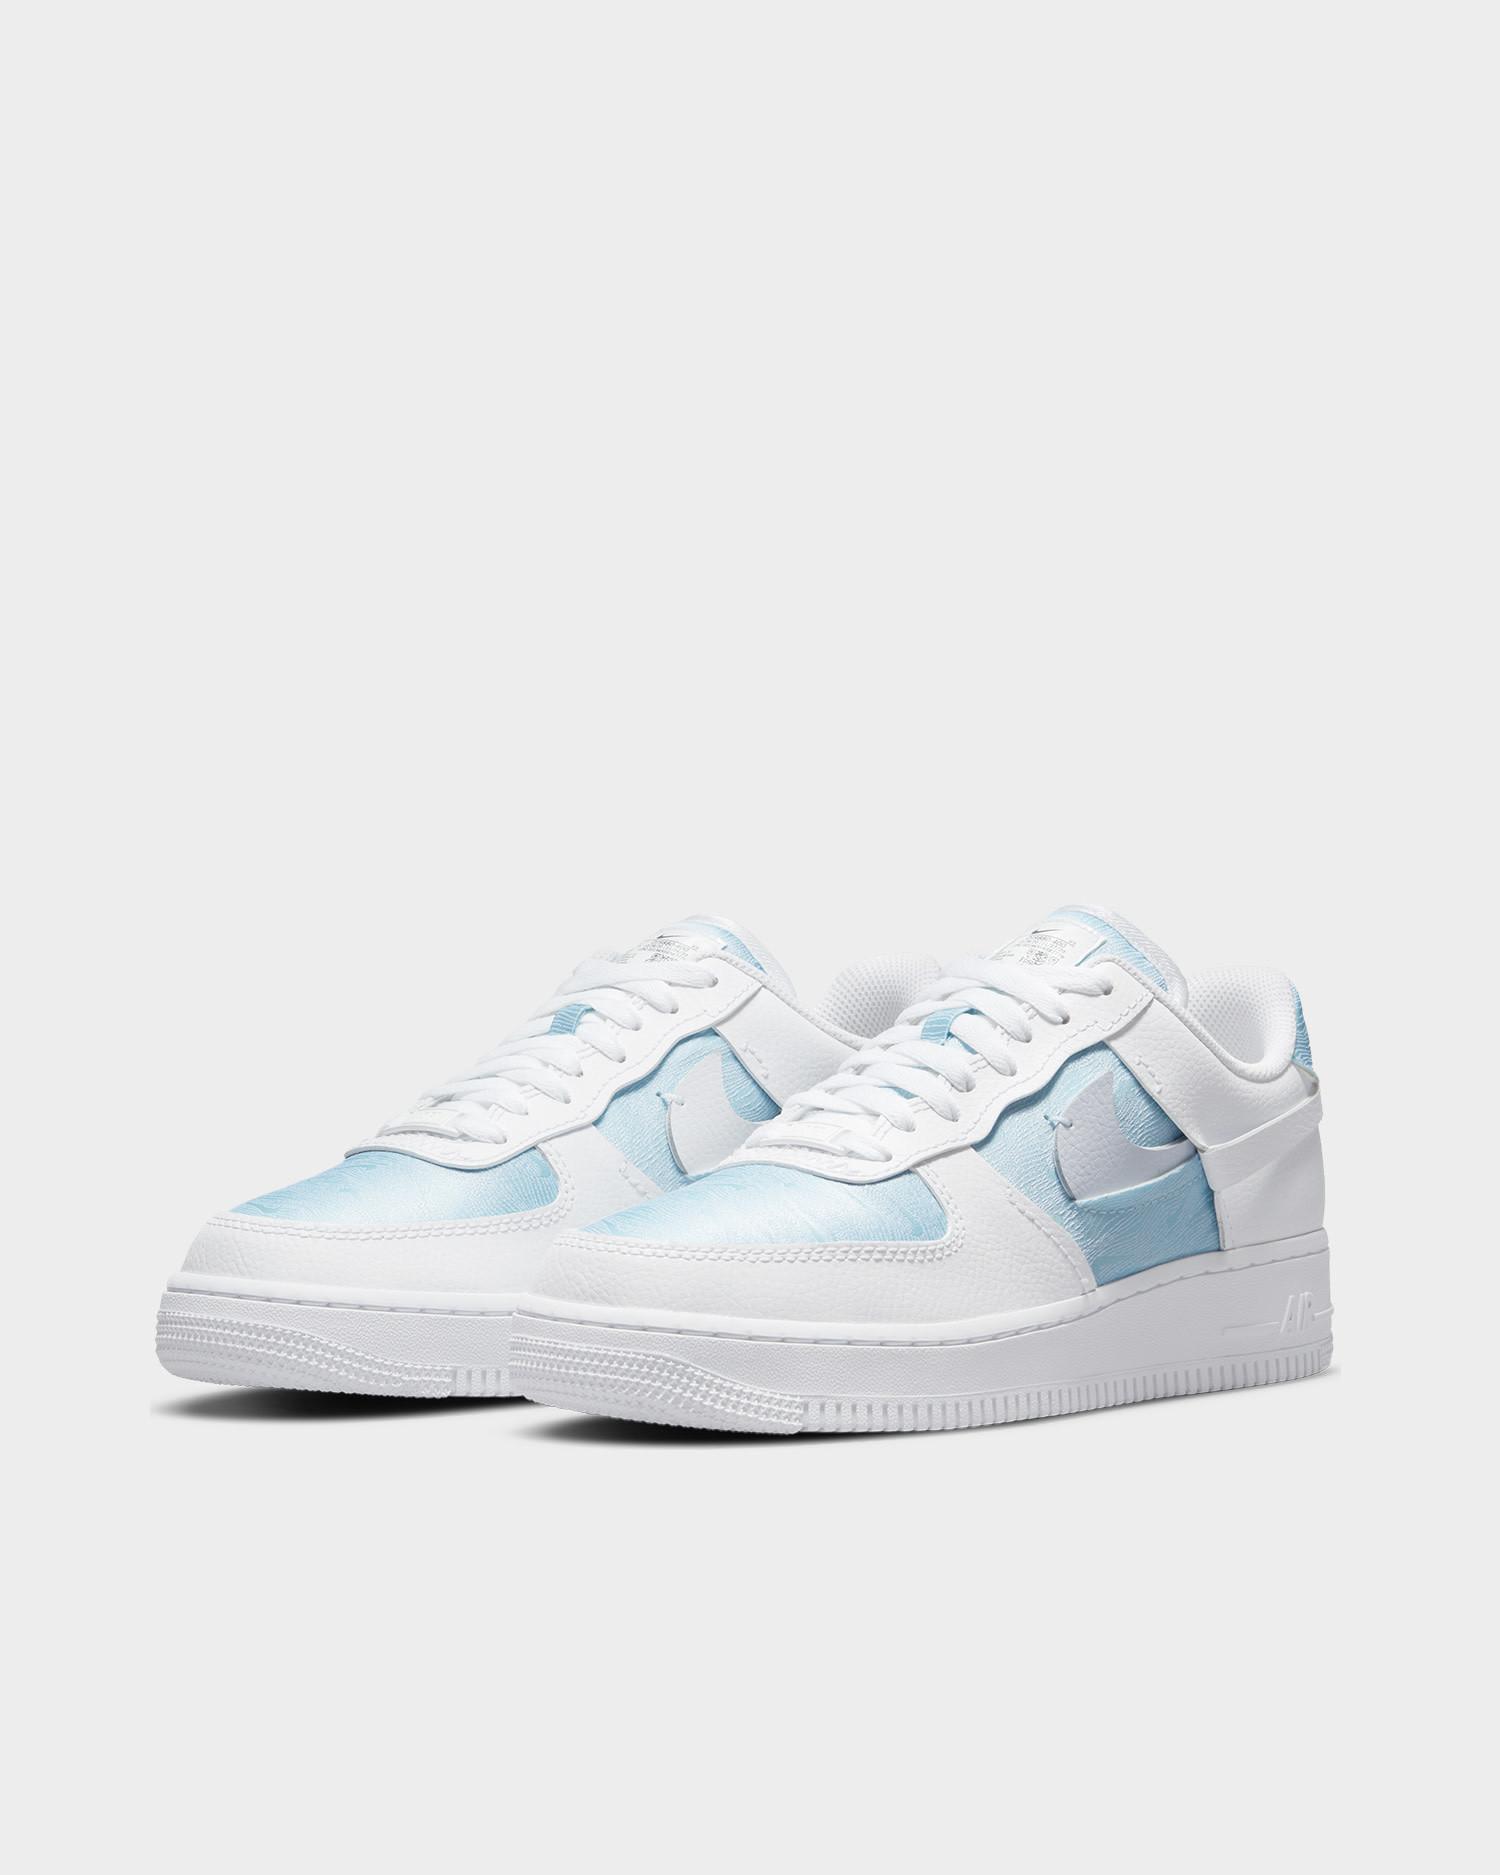 Nike Wmns nike af1 lxx Glacier blue/white-black